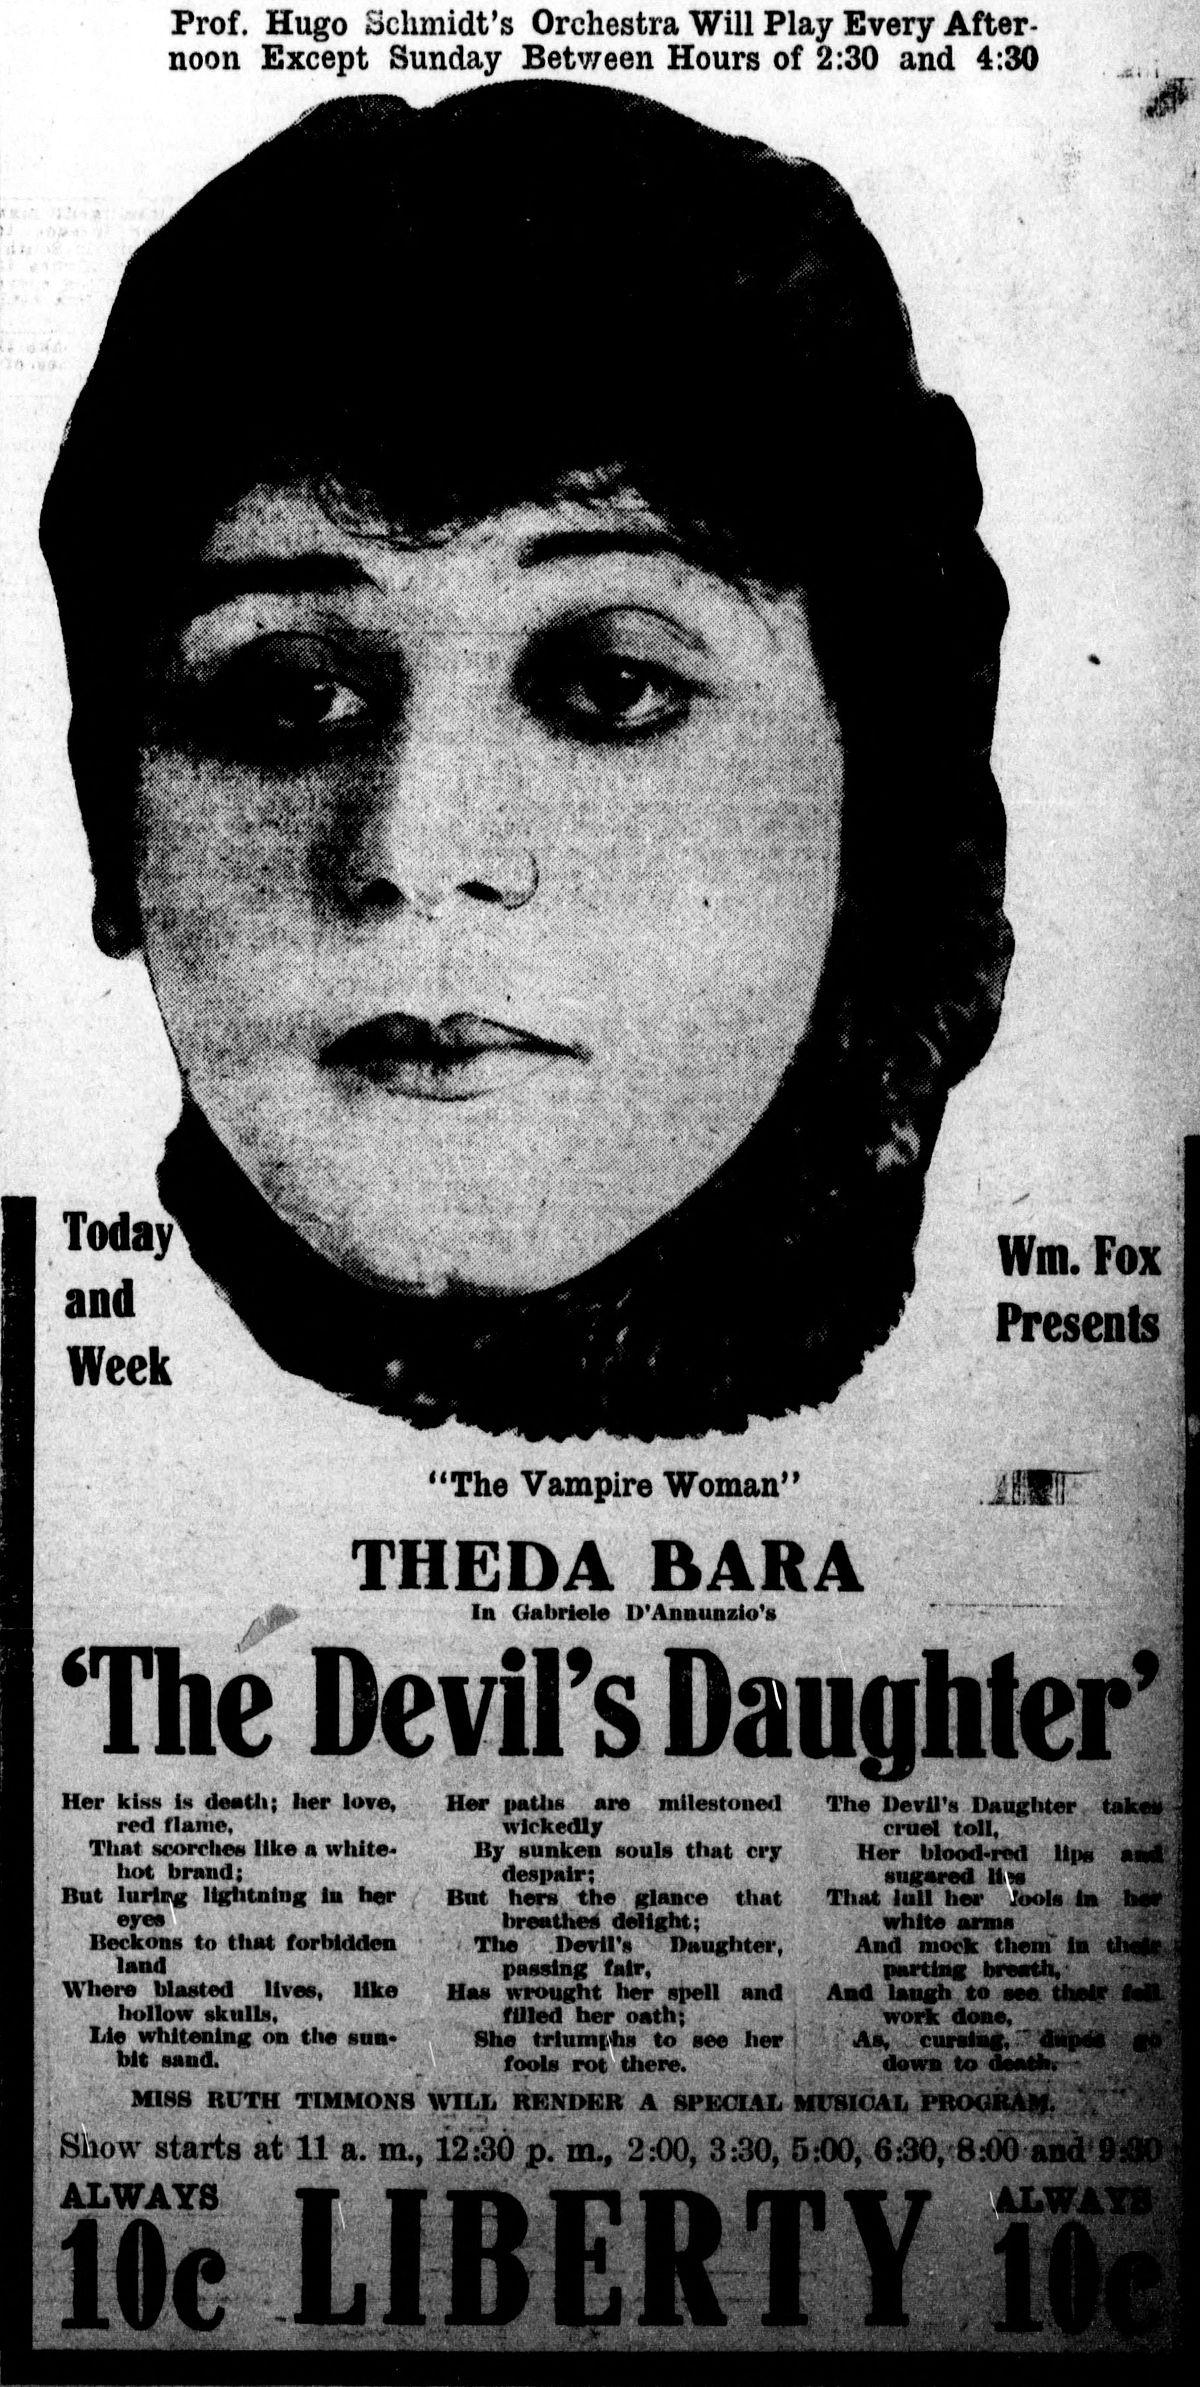 The Devils Daughter 1915 Film